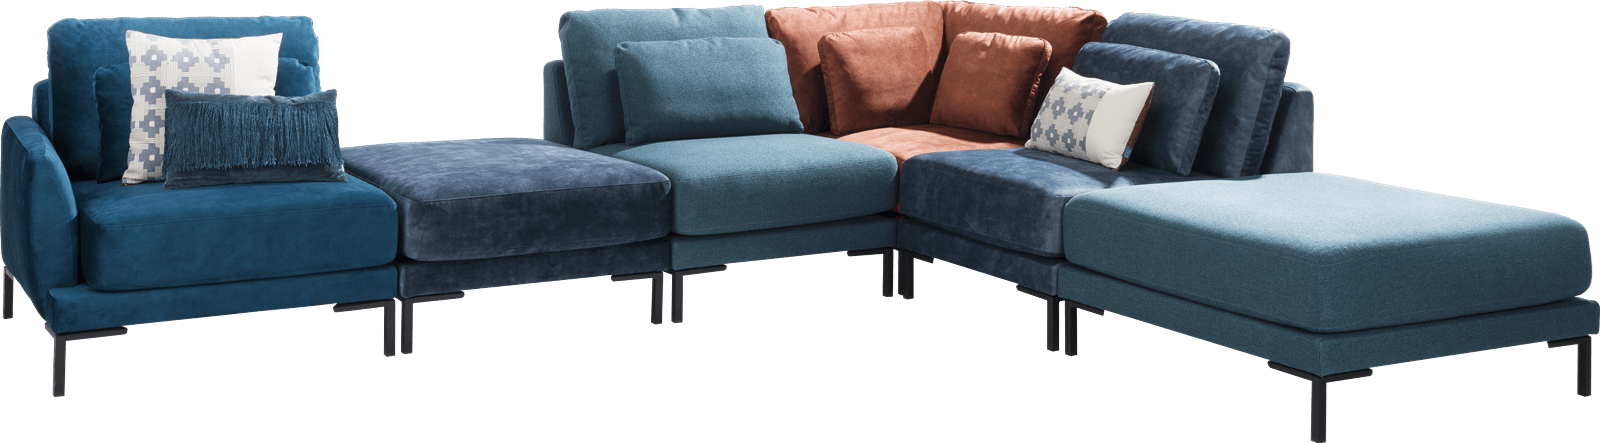 XOOON - Toledos - Design minimaliste - 1-places accoudoir gauche - 80 cm